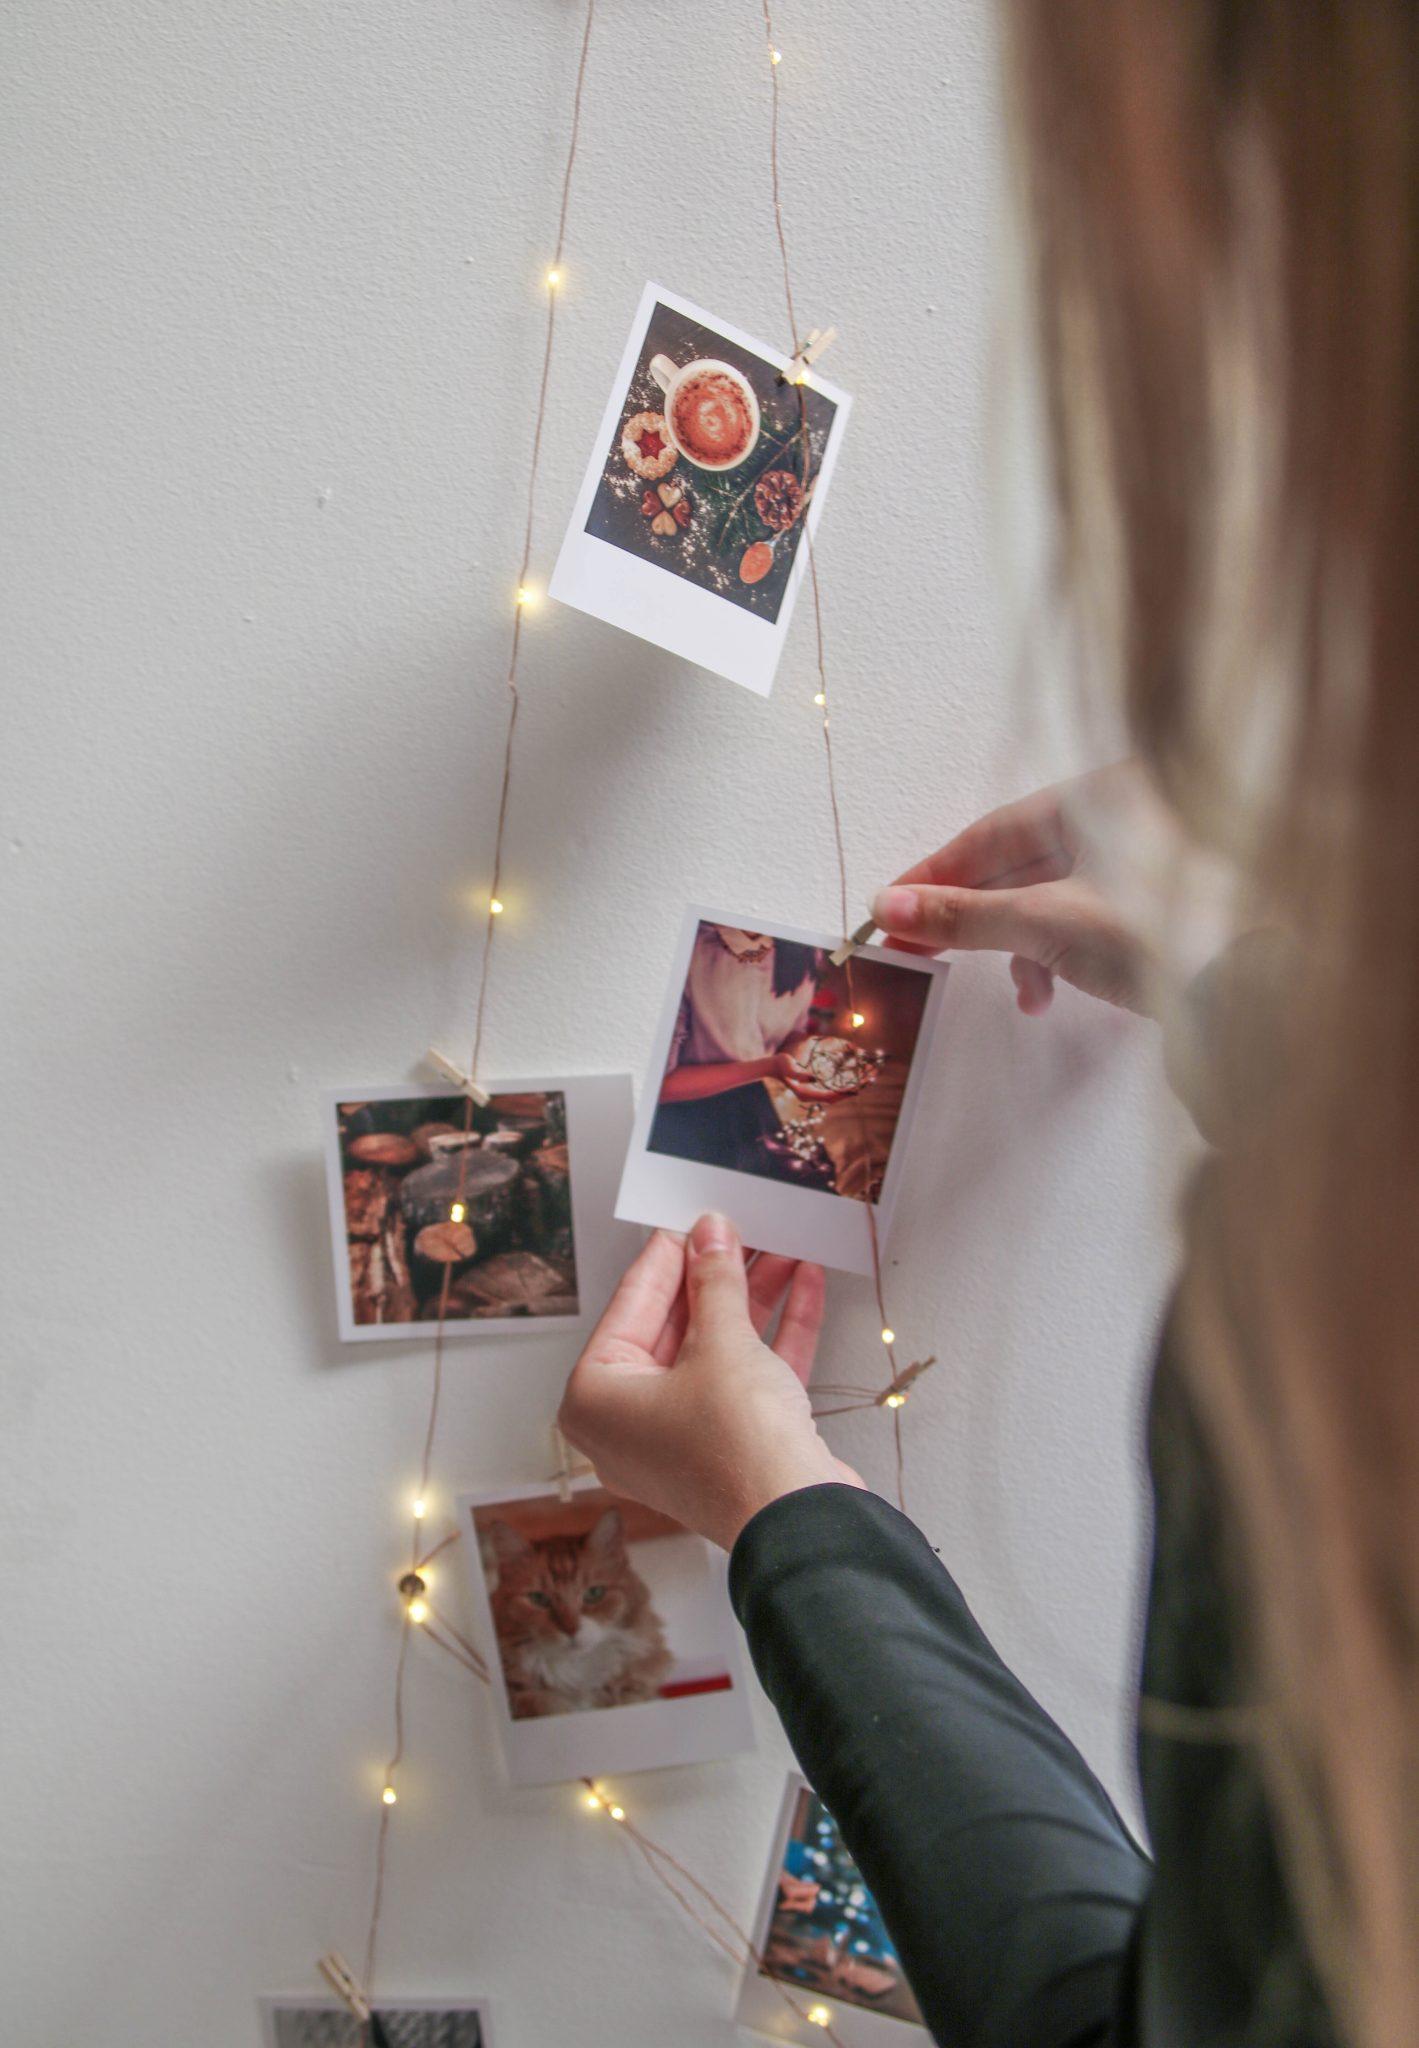 tuto noel diy sapin photos lumineux décoration